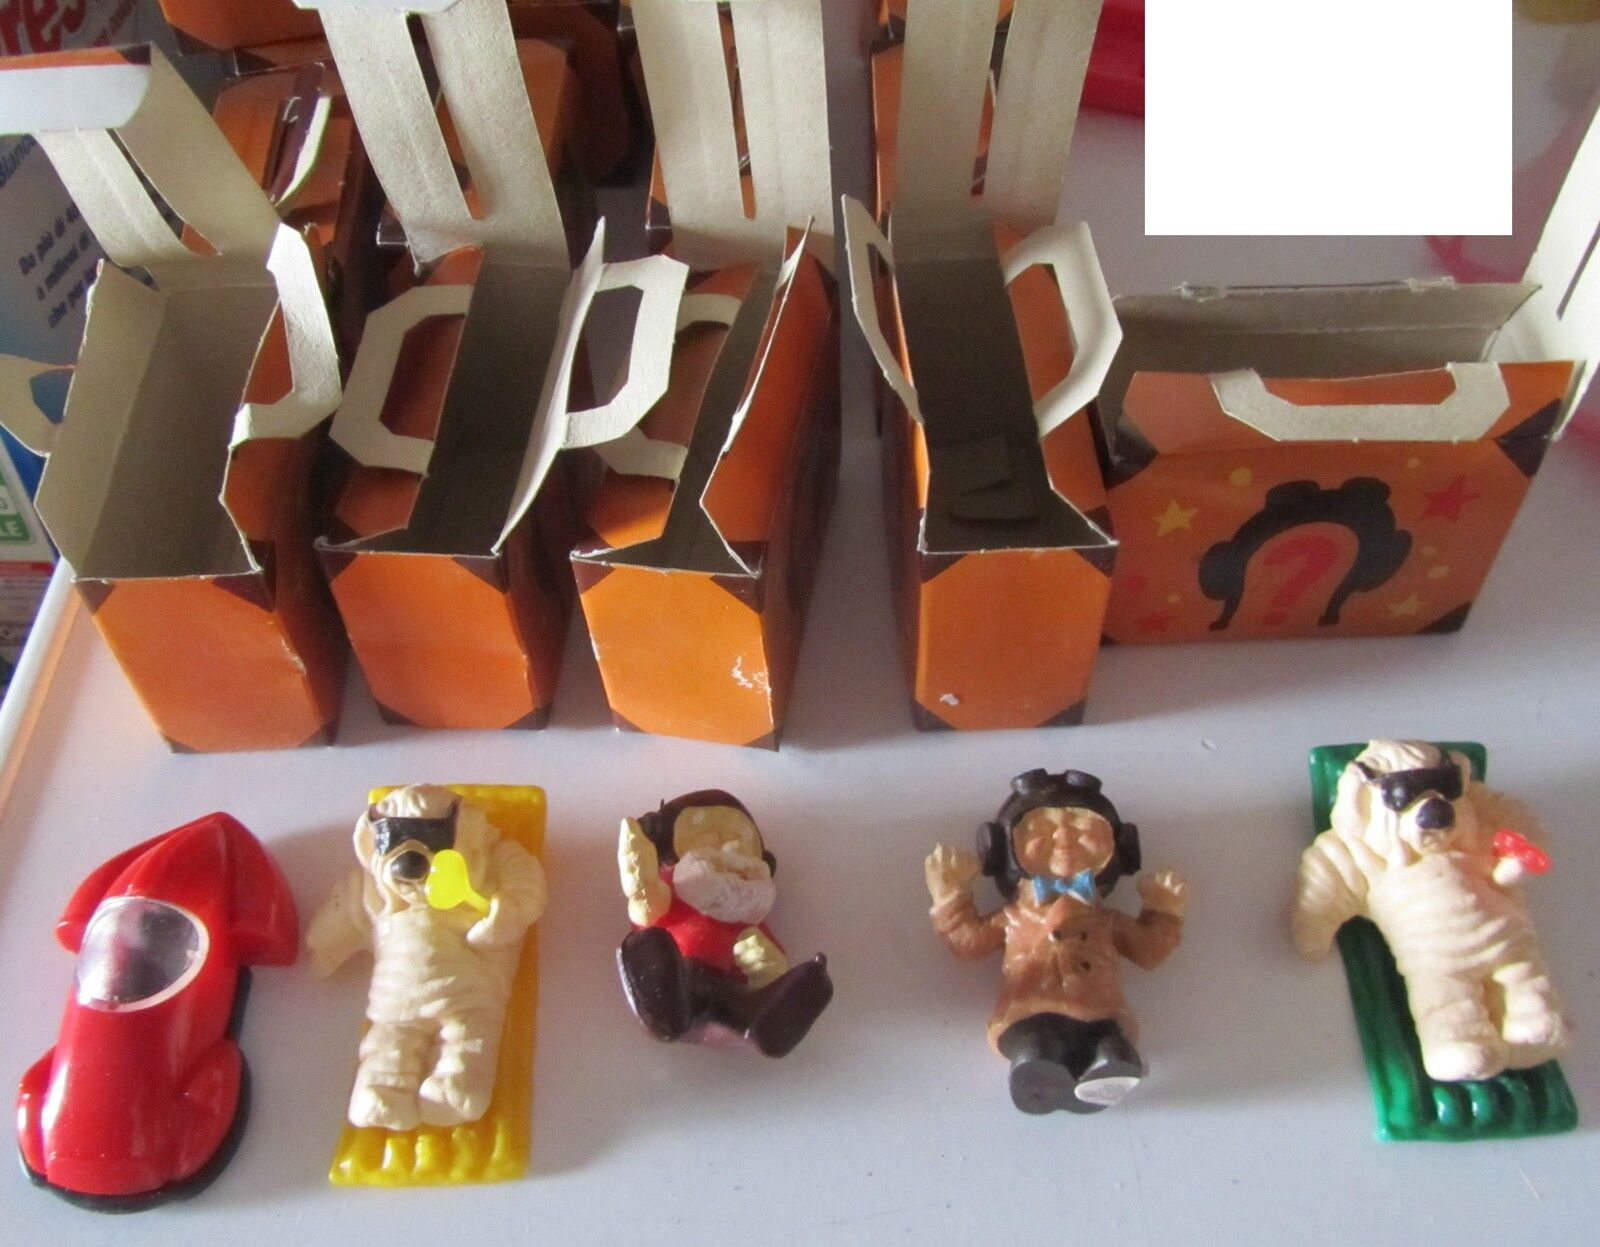 Serie 5 personaggi Ciribiribì Ciripiripì Kodak pubblicitario gadget vintage